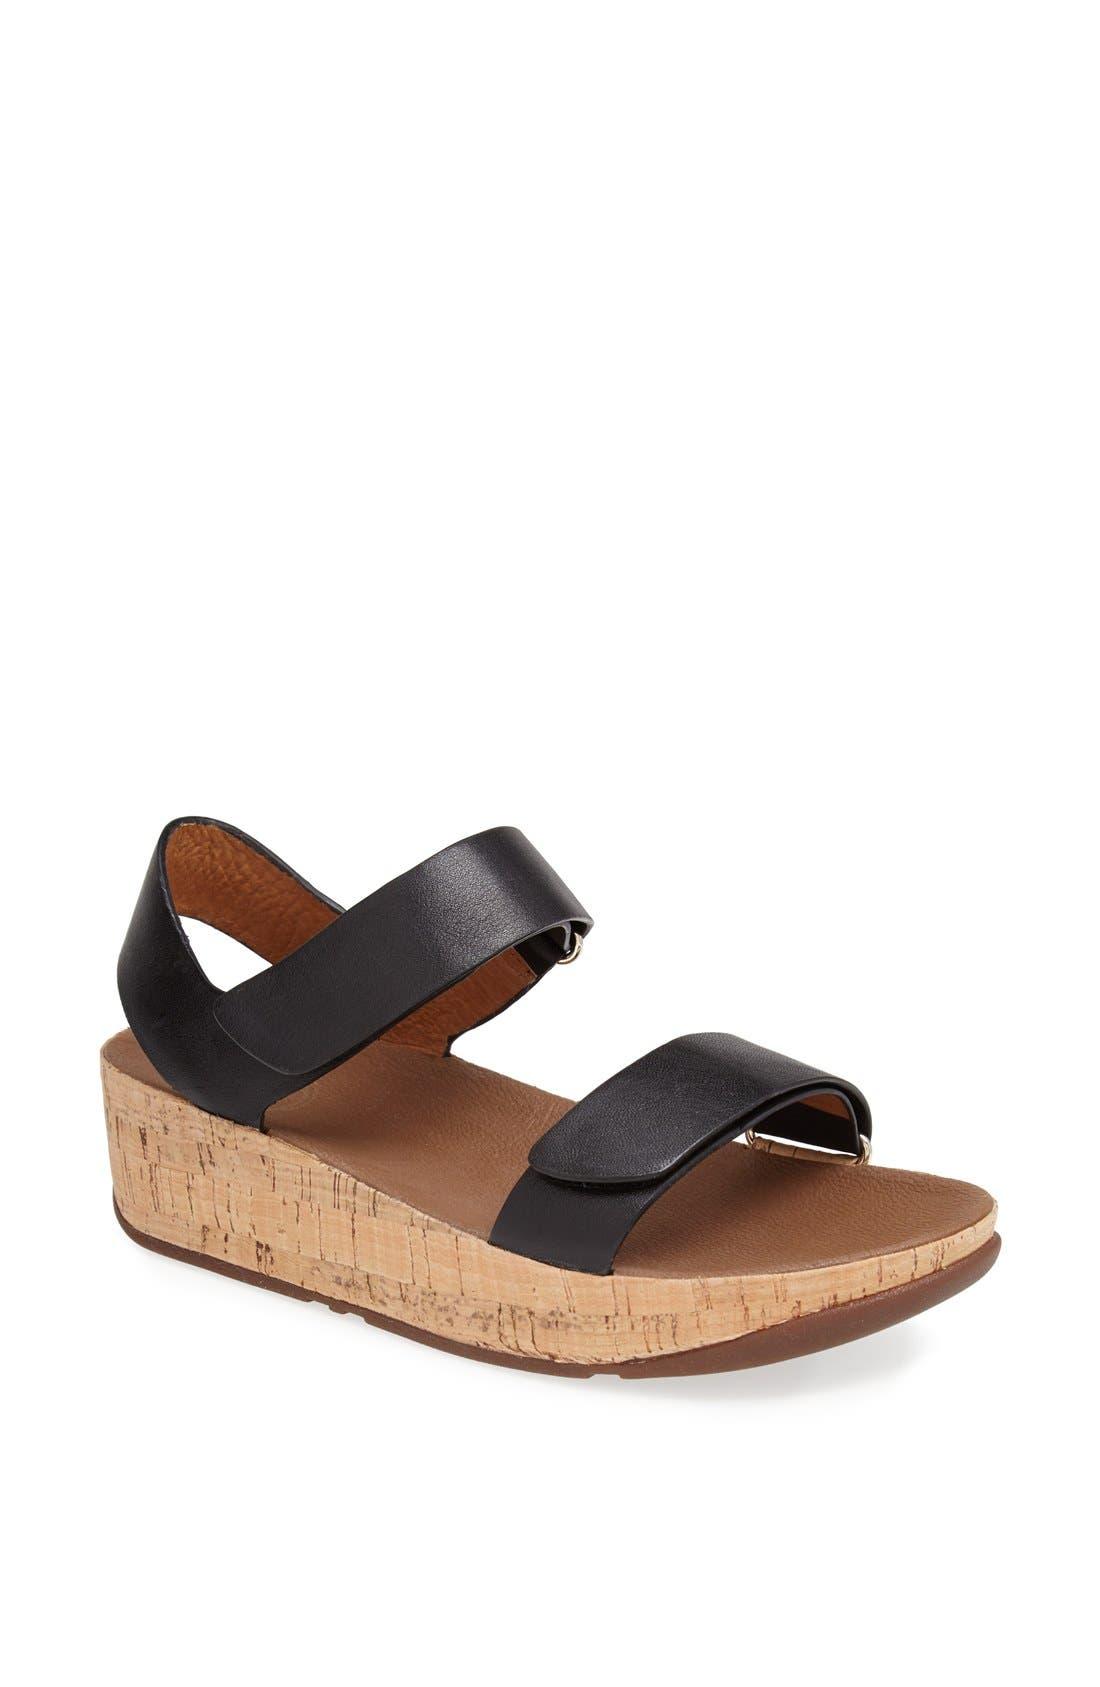 Main Image - FitFlop 'Bon Easy' Sandal